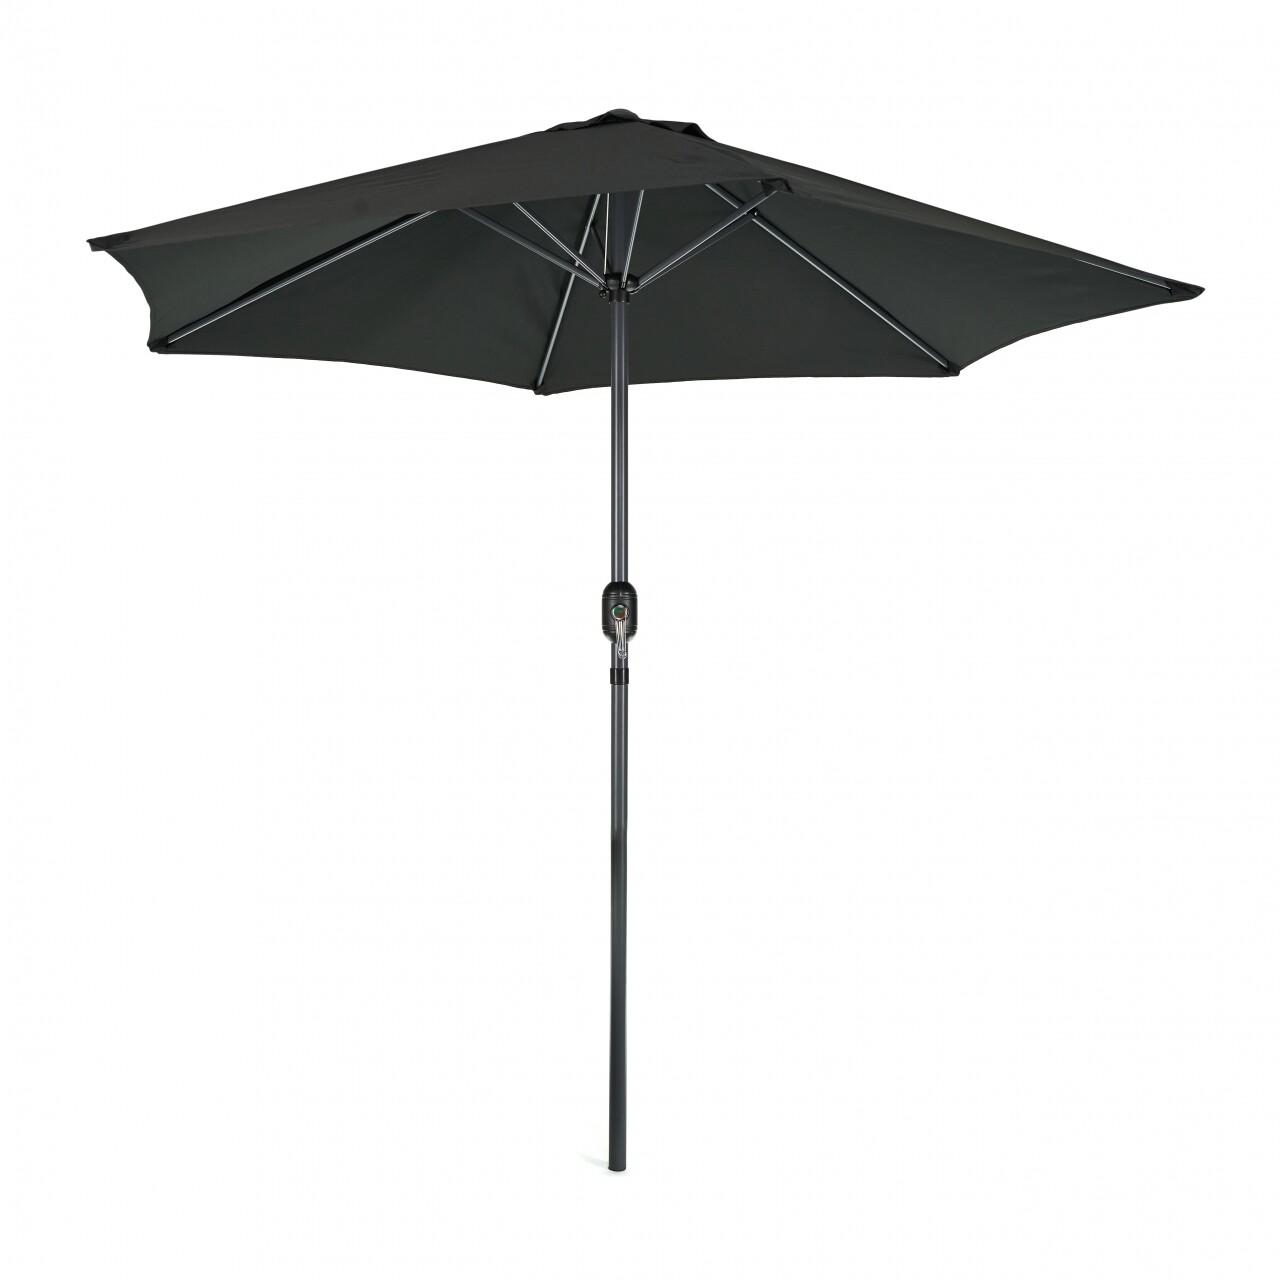 Umbrela universala cu manivela, Heinner, 38 cm, negru